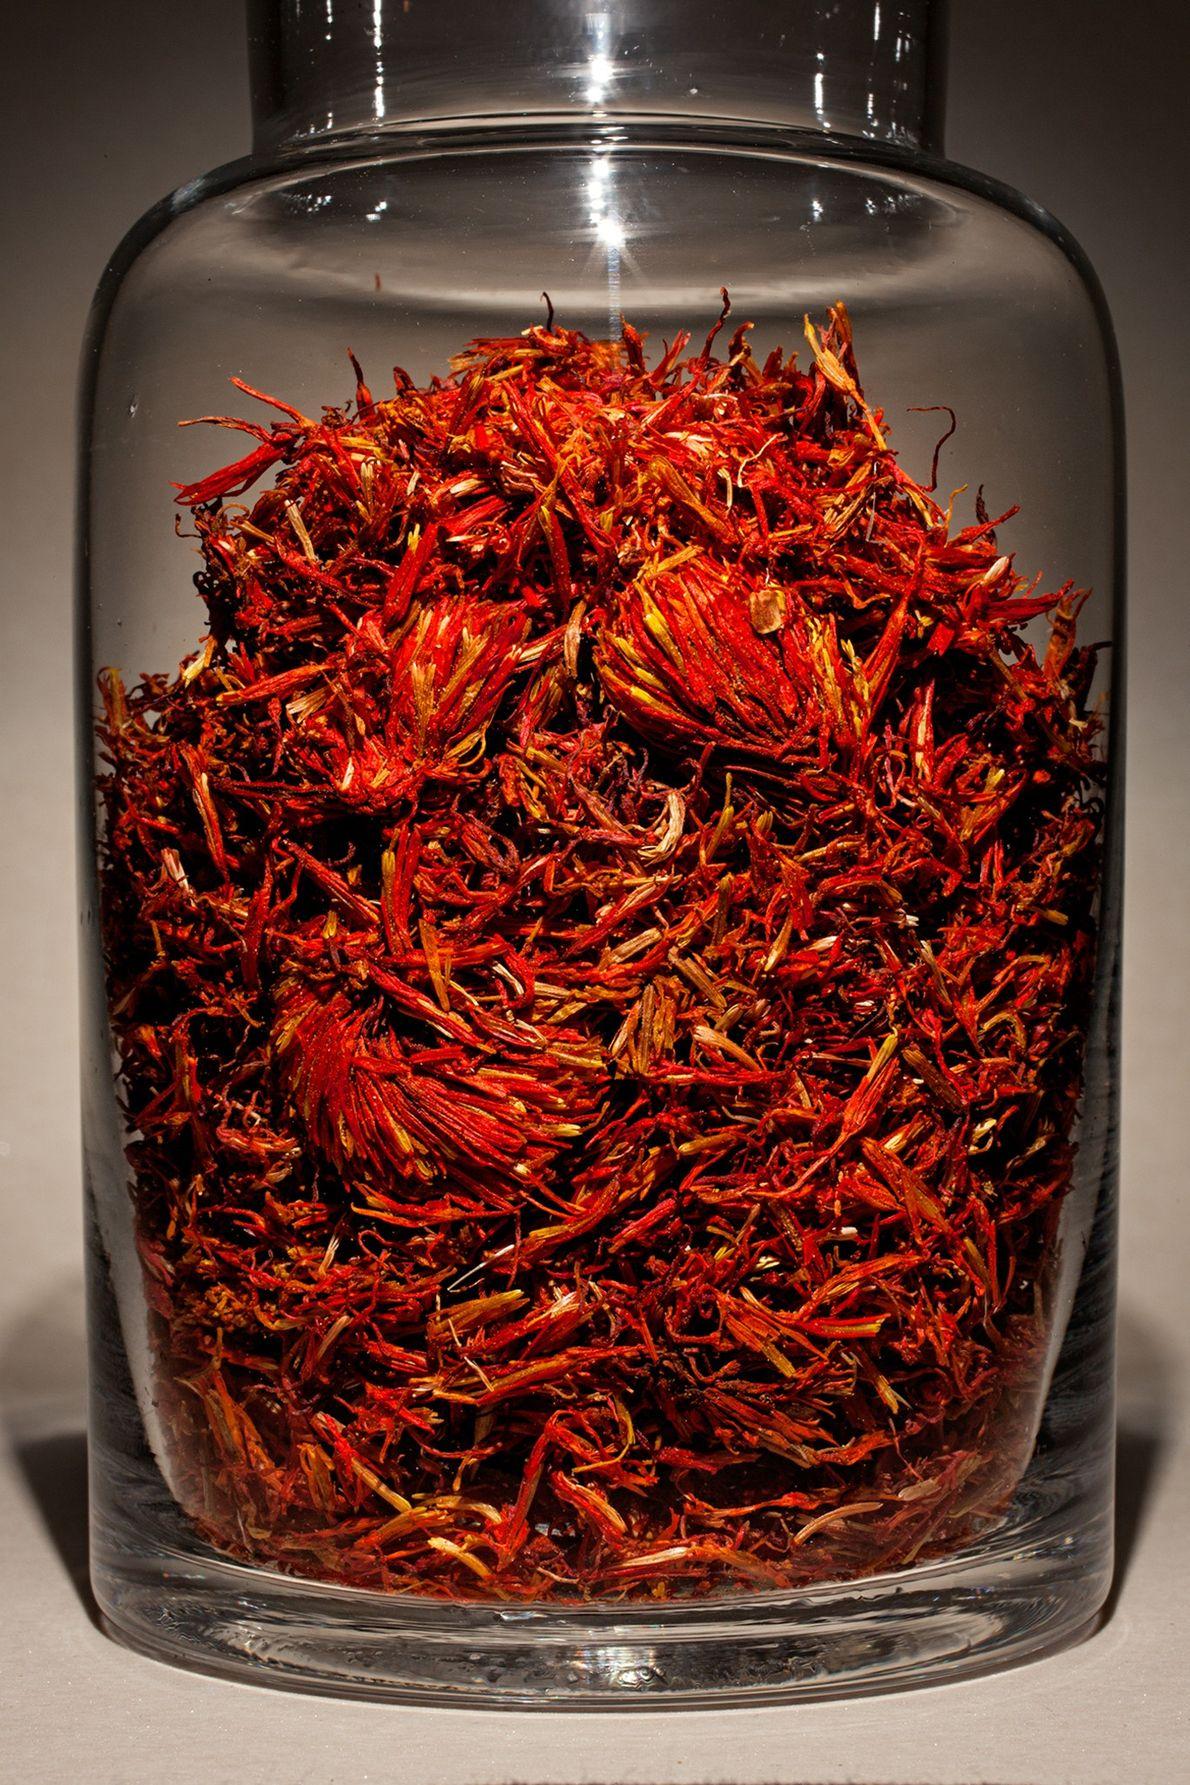 Nombre común: Cártamo o alazor  Latín: Carthamus tinctorius  Chino: Hong hua  Usos: Dolor posparto, úlceras cutáneas.